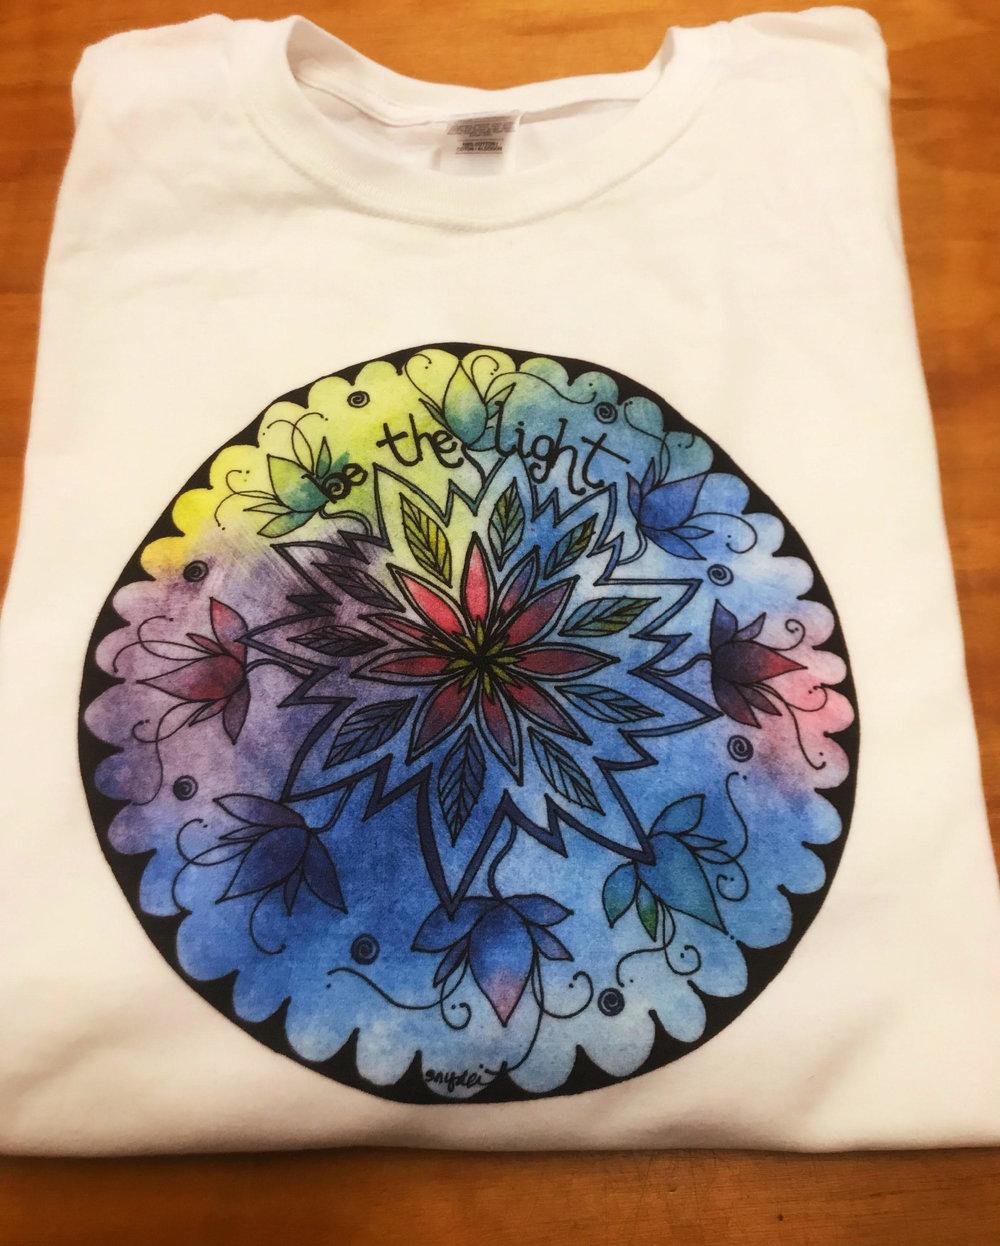 An example of a full color digital print. Artwork by Sherri Snyder (www.InspiredbyStillness.com)